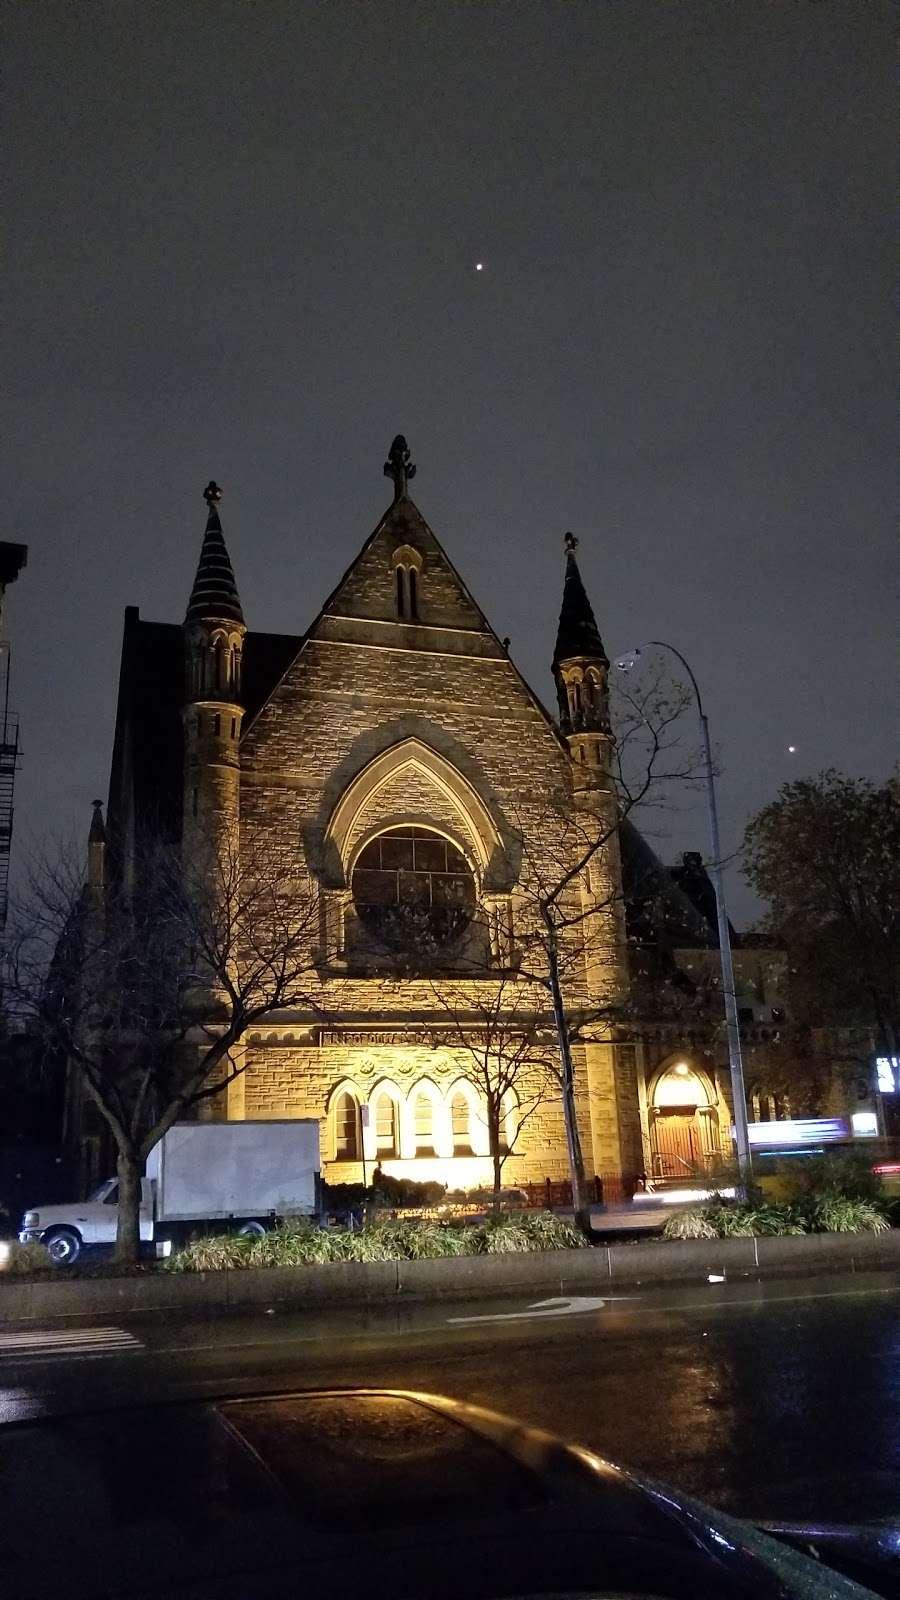 Salem United Methodist Church - church  | Photo 3 of 10 | Address: 2190 Adam Clayton Powell Jr Blvd, New York, NY 10027, USA | Phone: (212) 678-2700